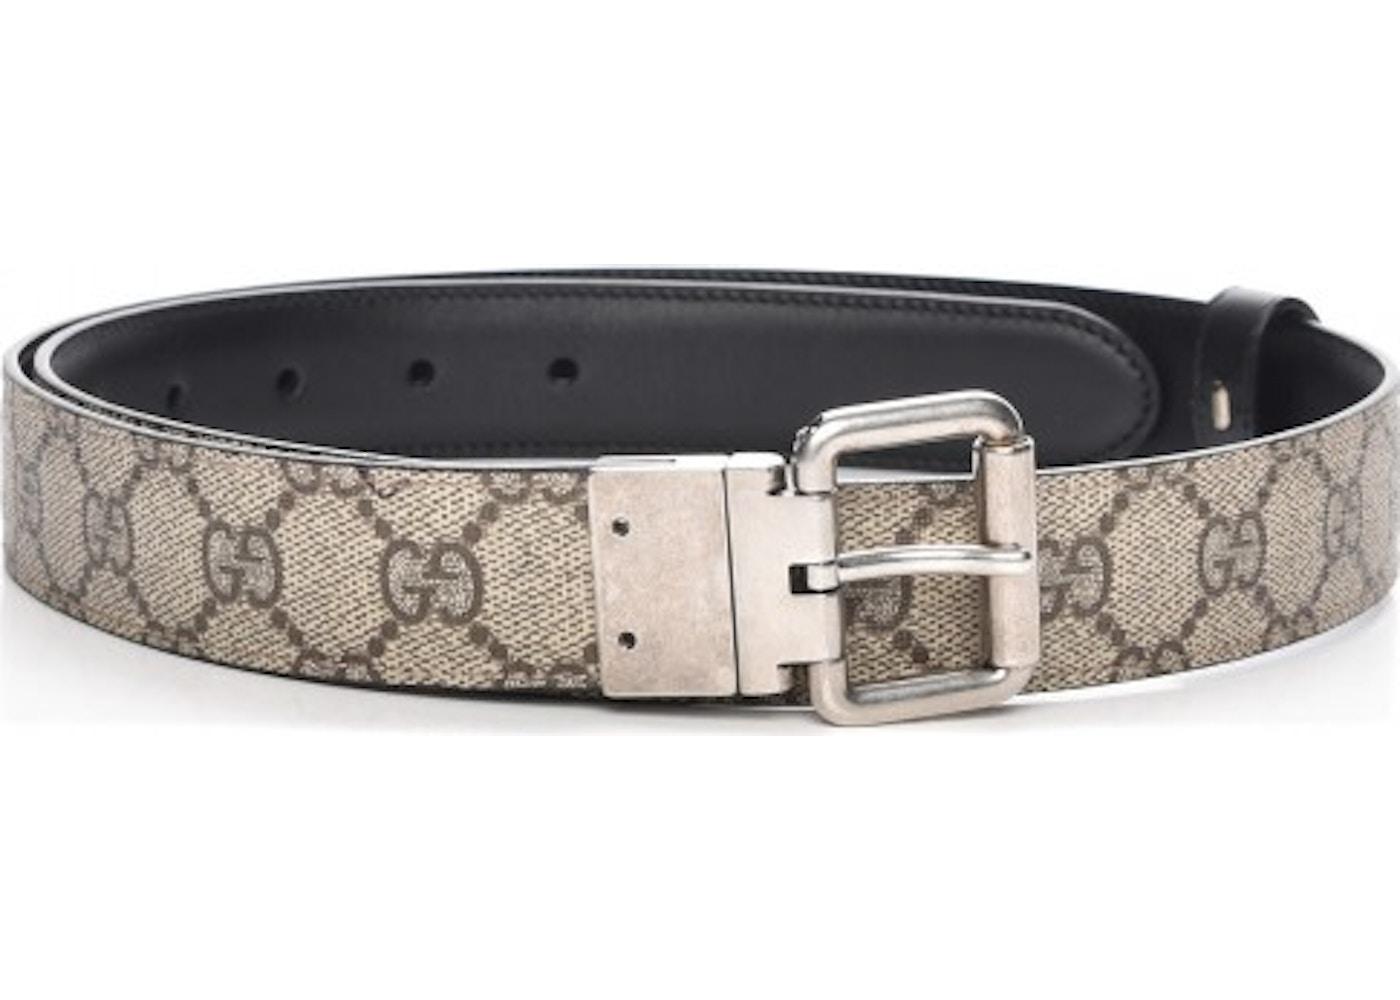 c2f6c255de1 Gucci Reversible Belt Monogram GG 90 36 Black Beige